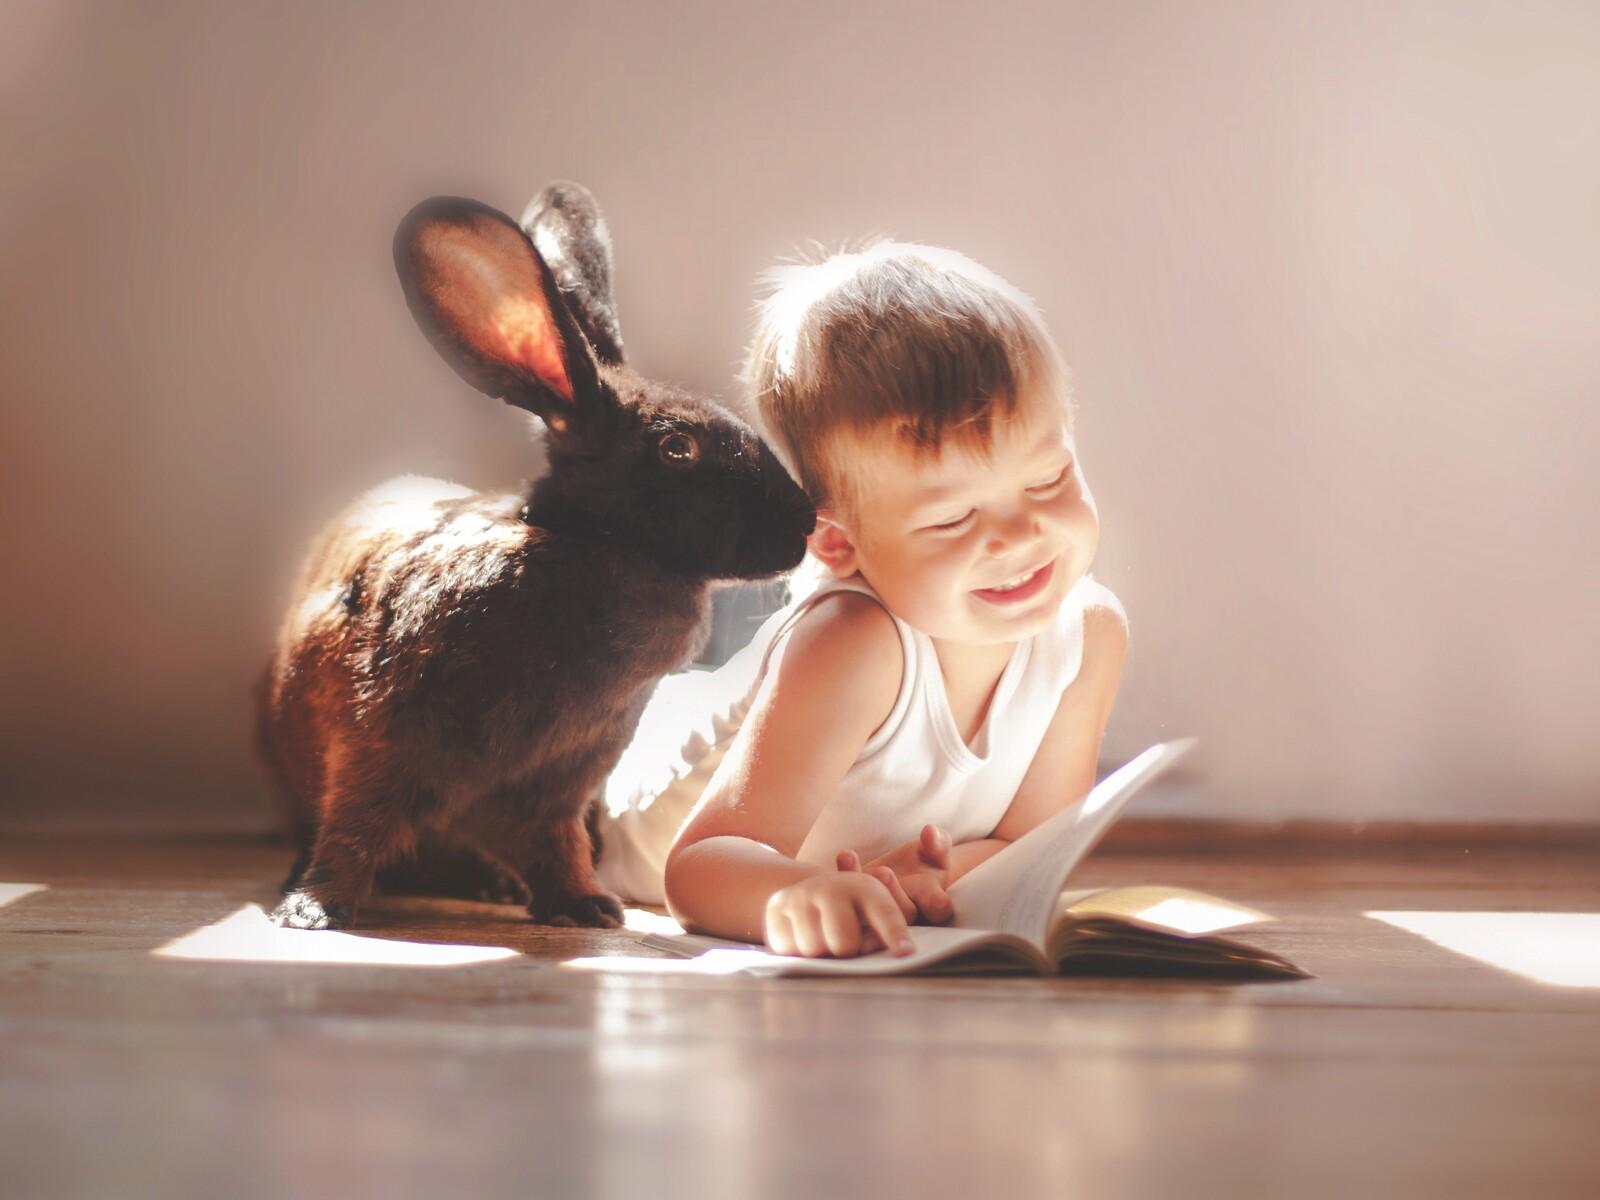 rabbit-and-children-cute-4k.jpg